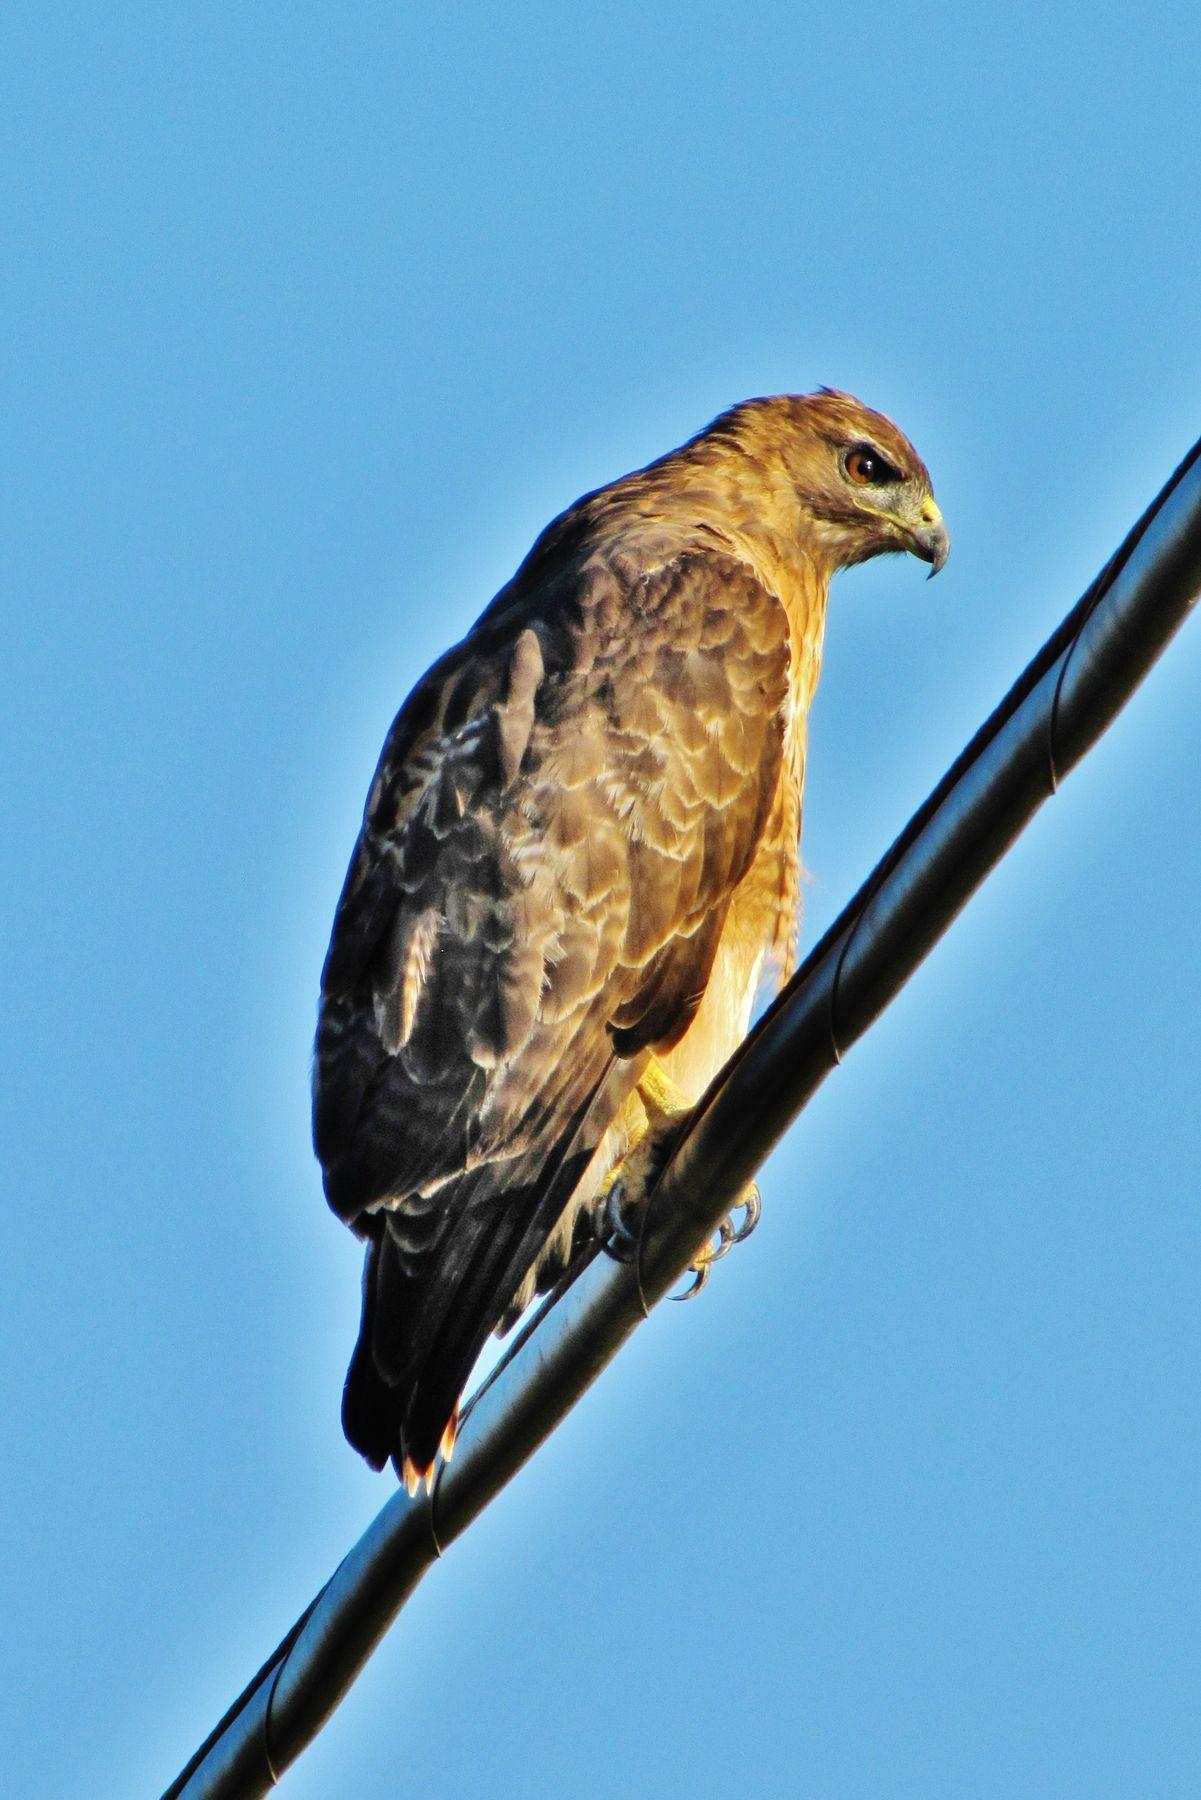 Краснохвостый сарыч краснохвостый сарыч хищная птица ястреб red-tailed hawk red-tail buteo jamaicensis bird of prey chickenhawk